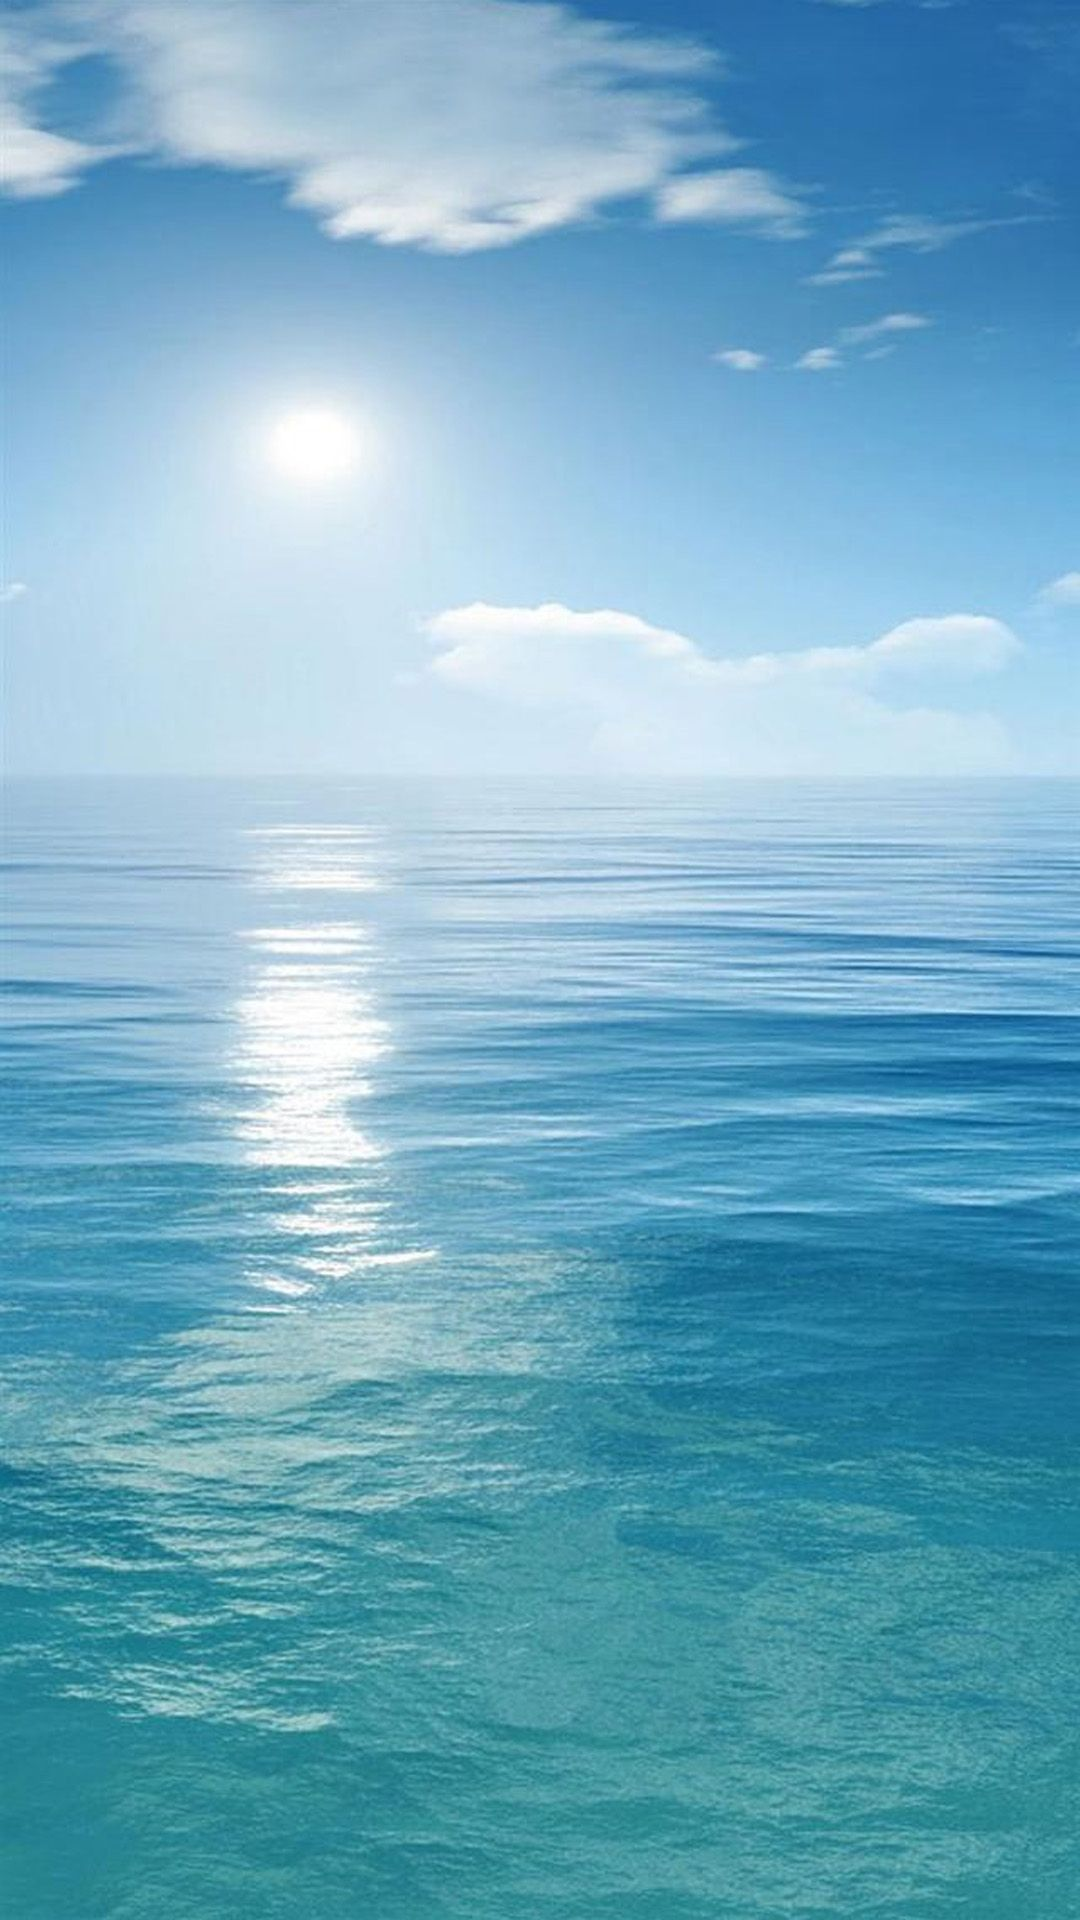 Blue Sea Summer Iphone Wallpapers Beach Landscape Ocean Scenes Skyscape